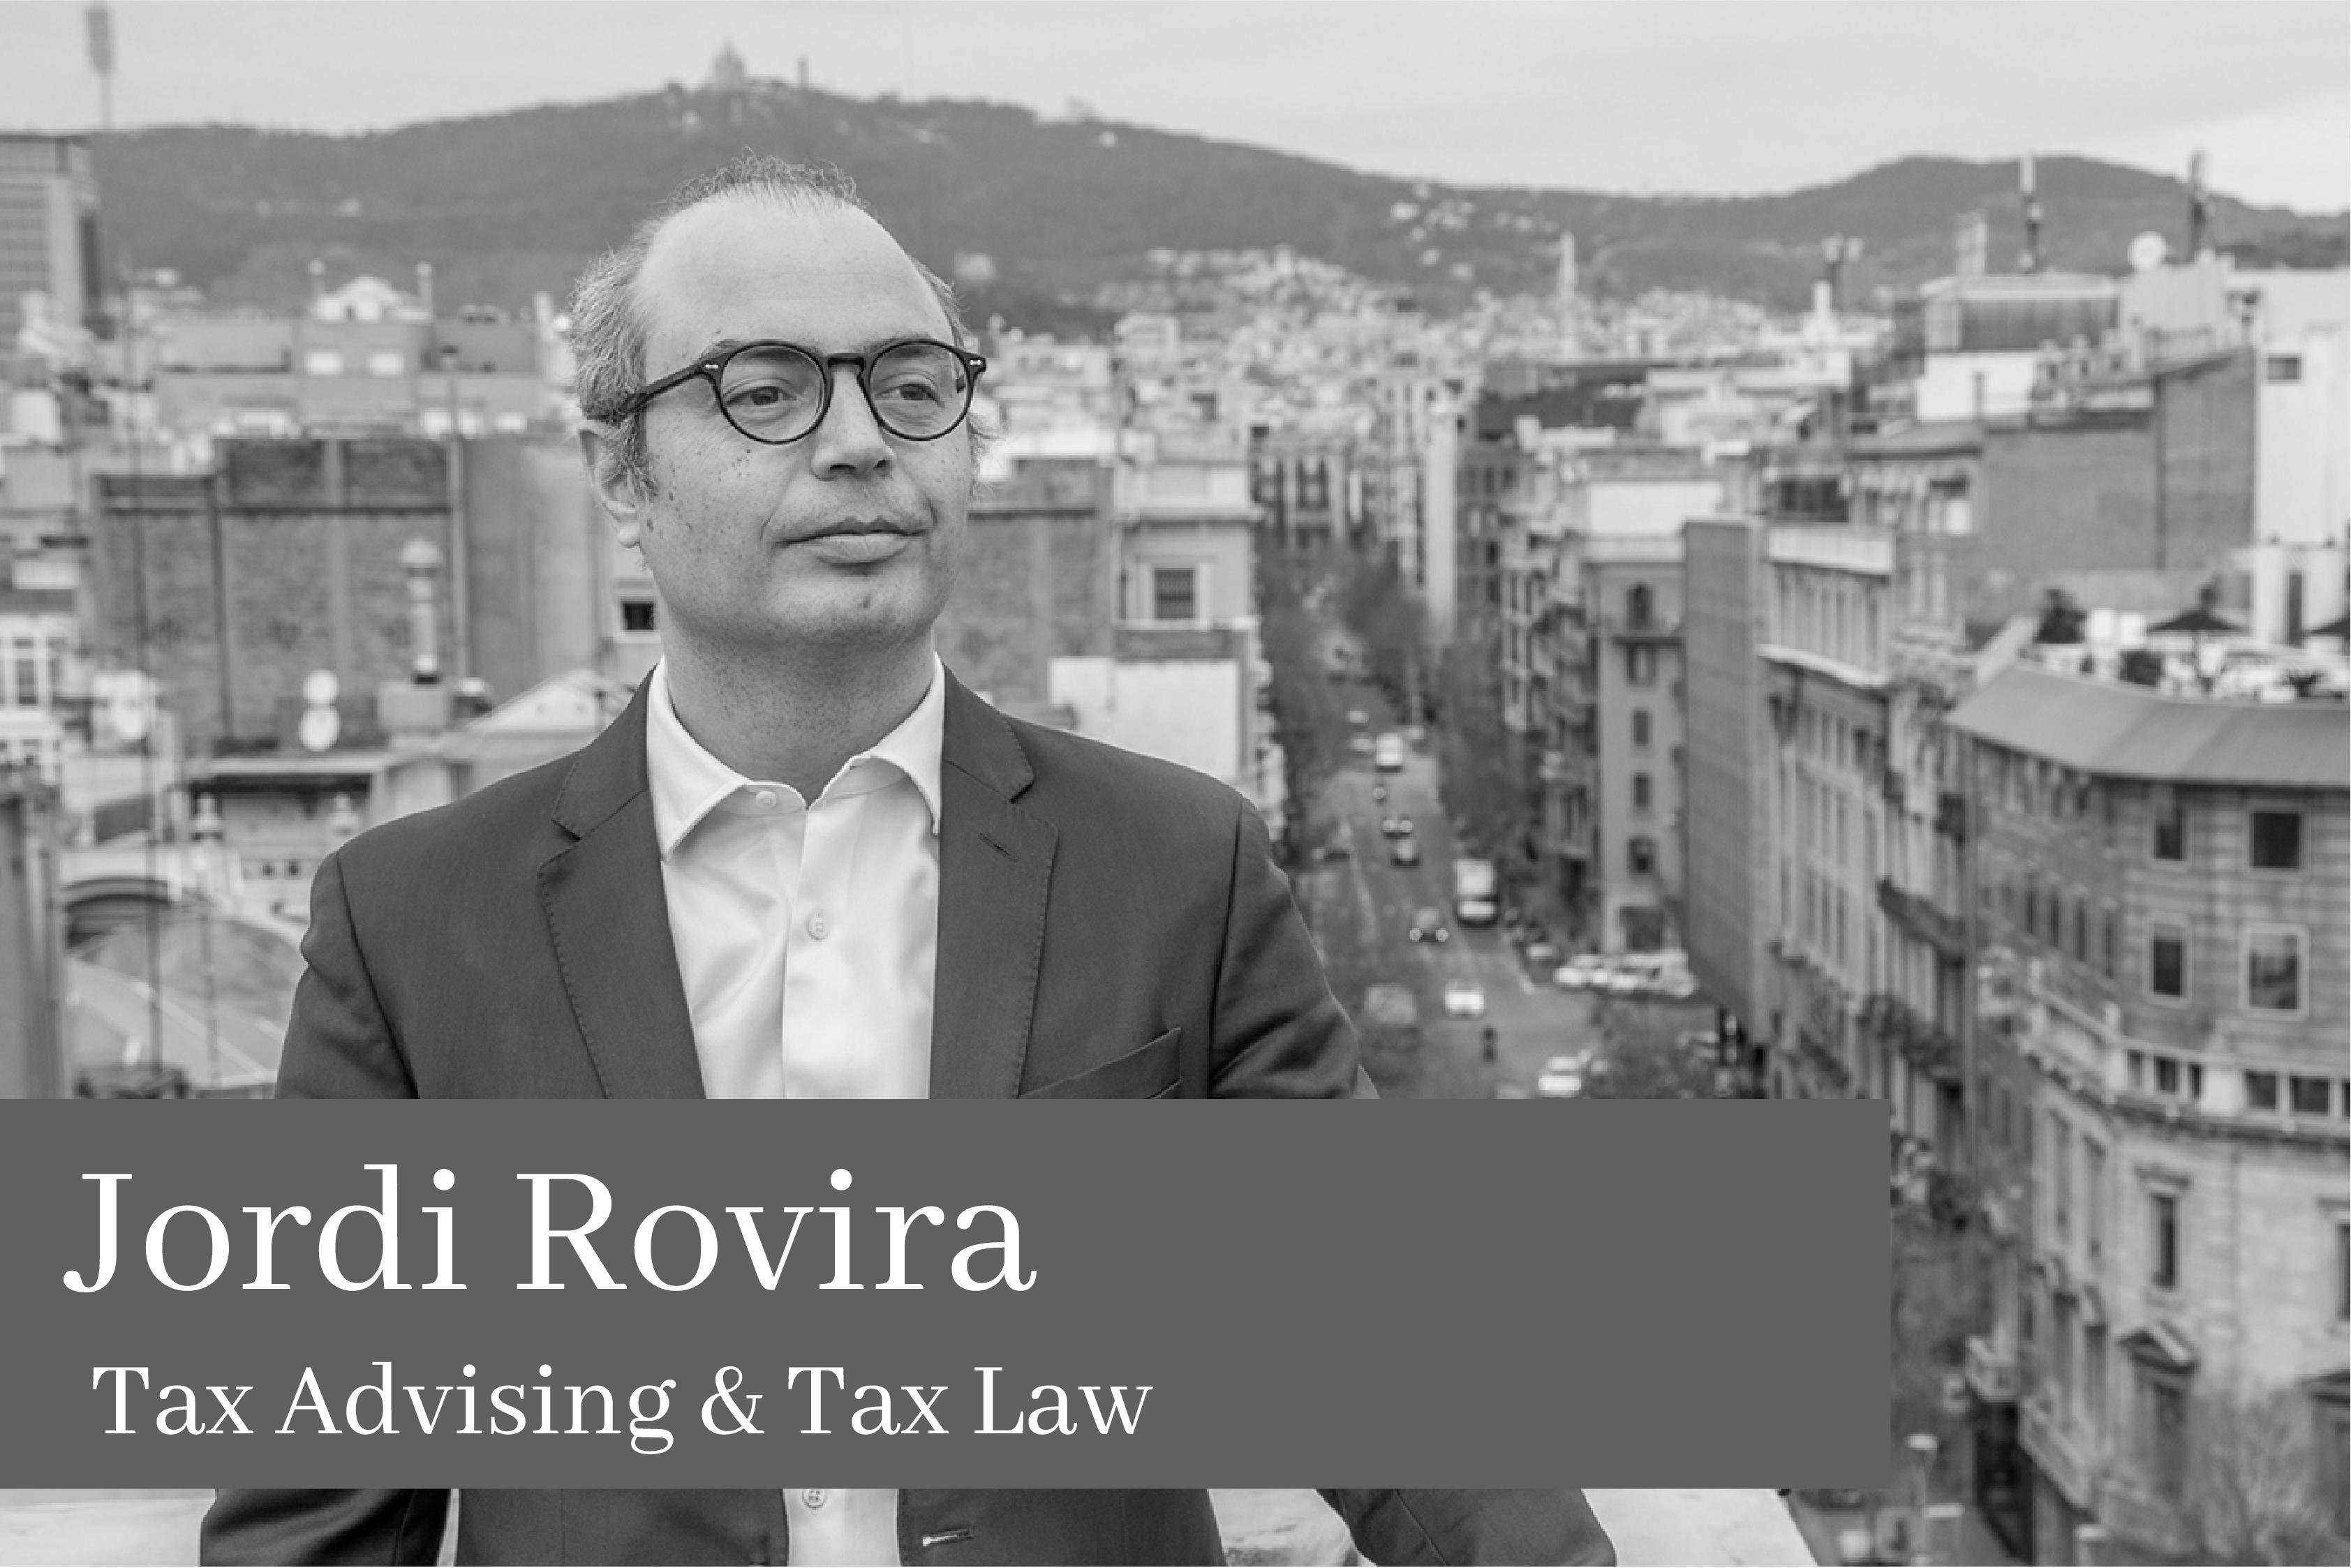 Subido a Jordi Rovira Esteve Tax Advising & Tax Law